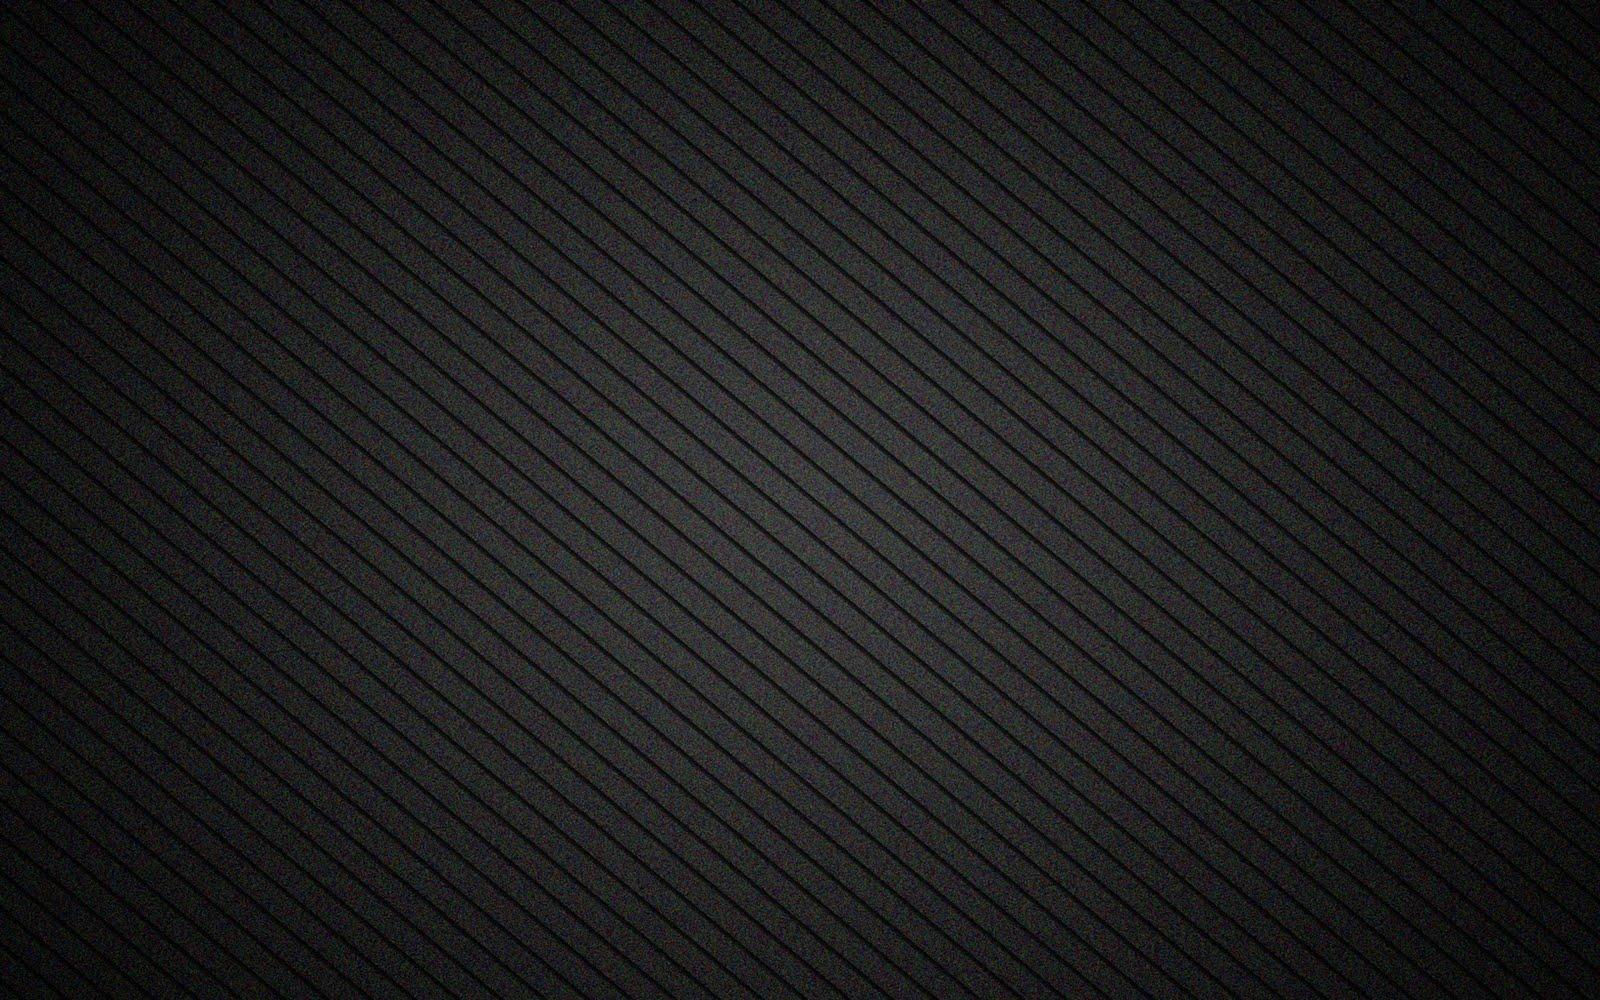 HD Wide Wallpapers 3D Black HD Wallpapers 30 1600x1000